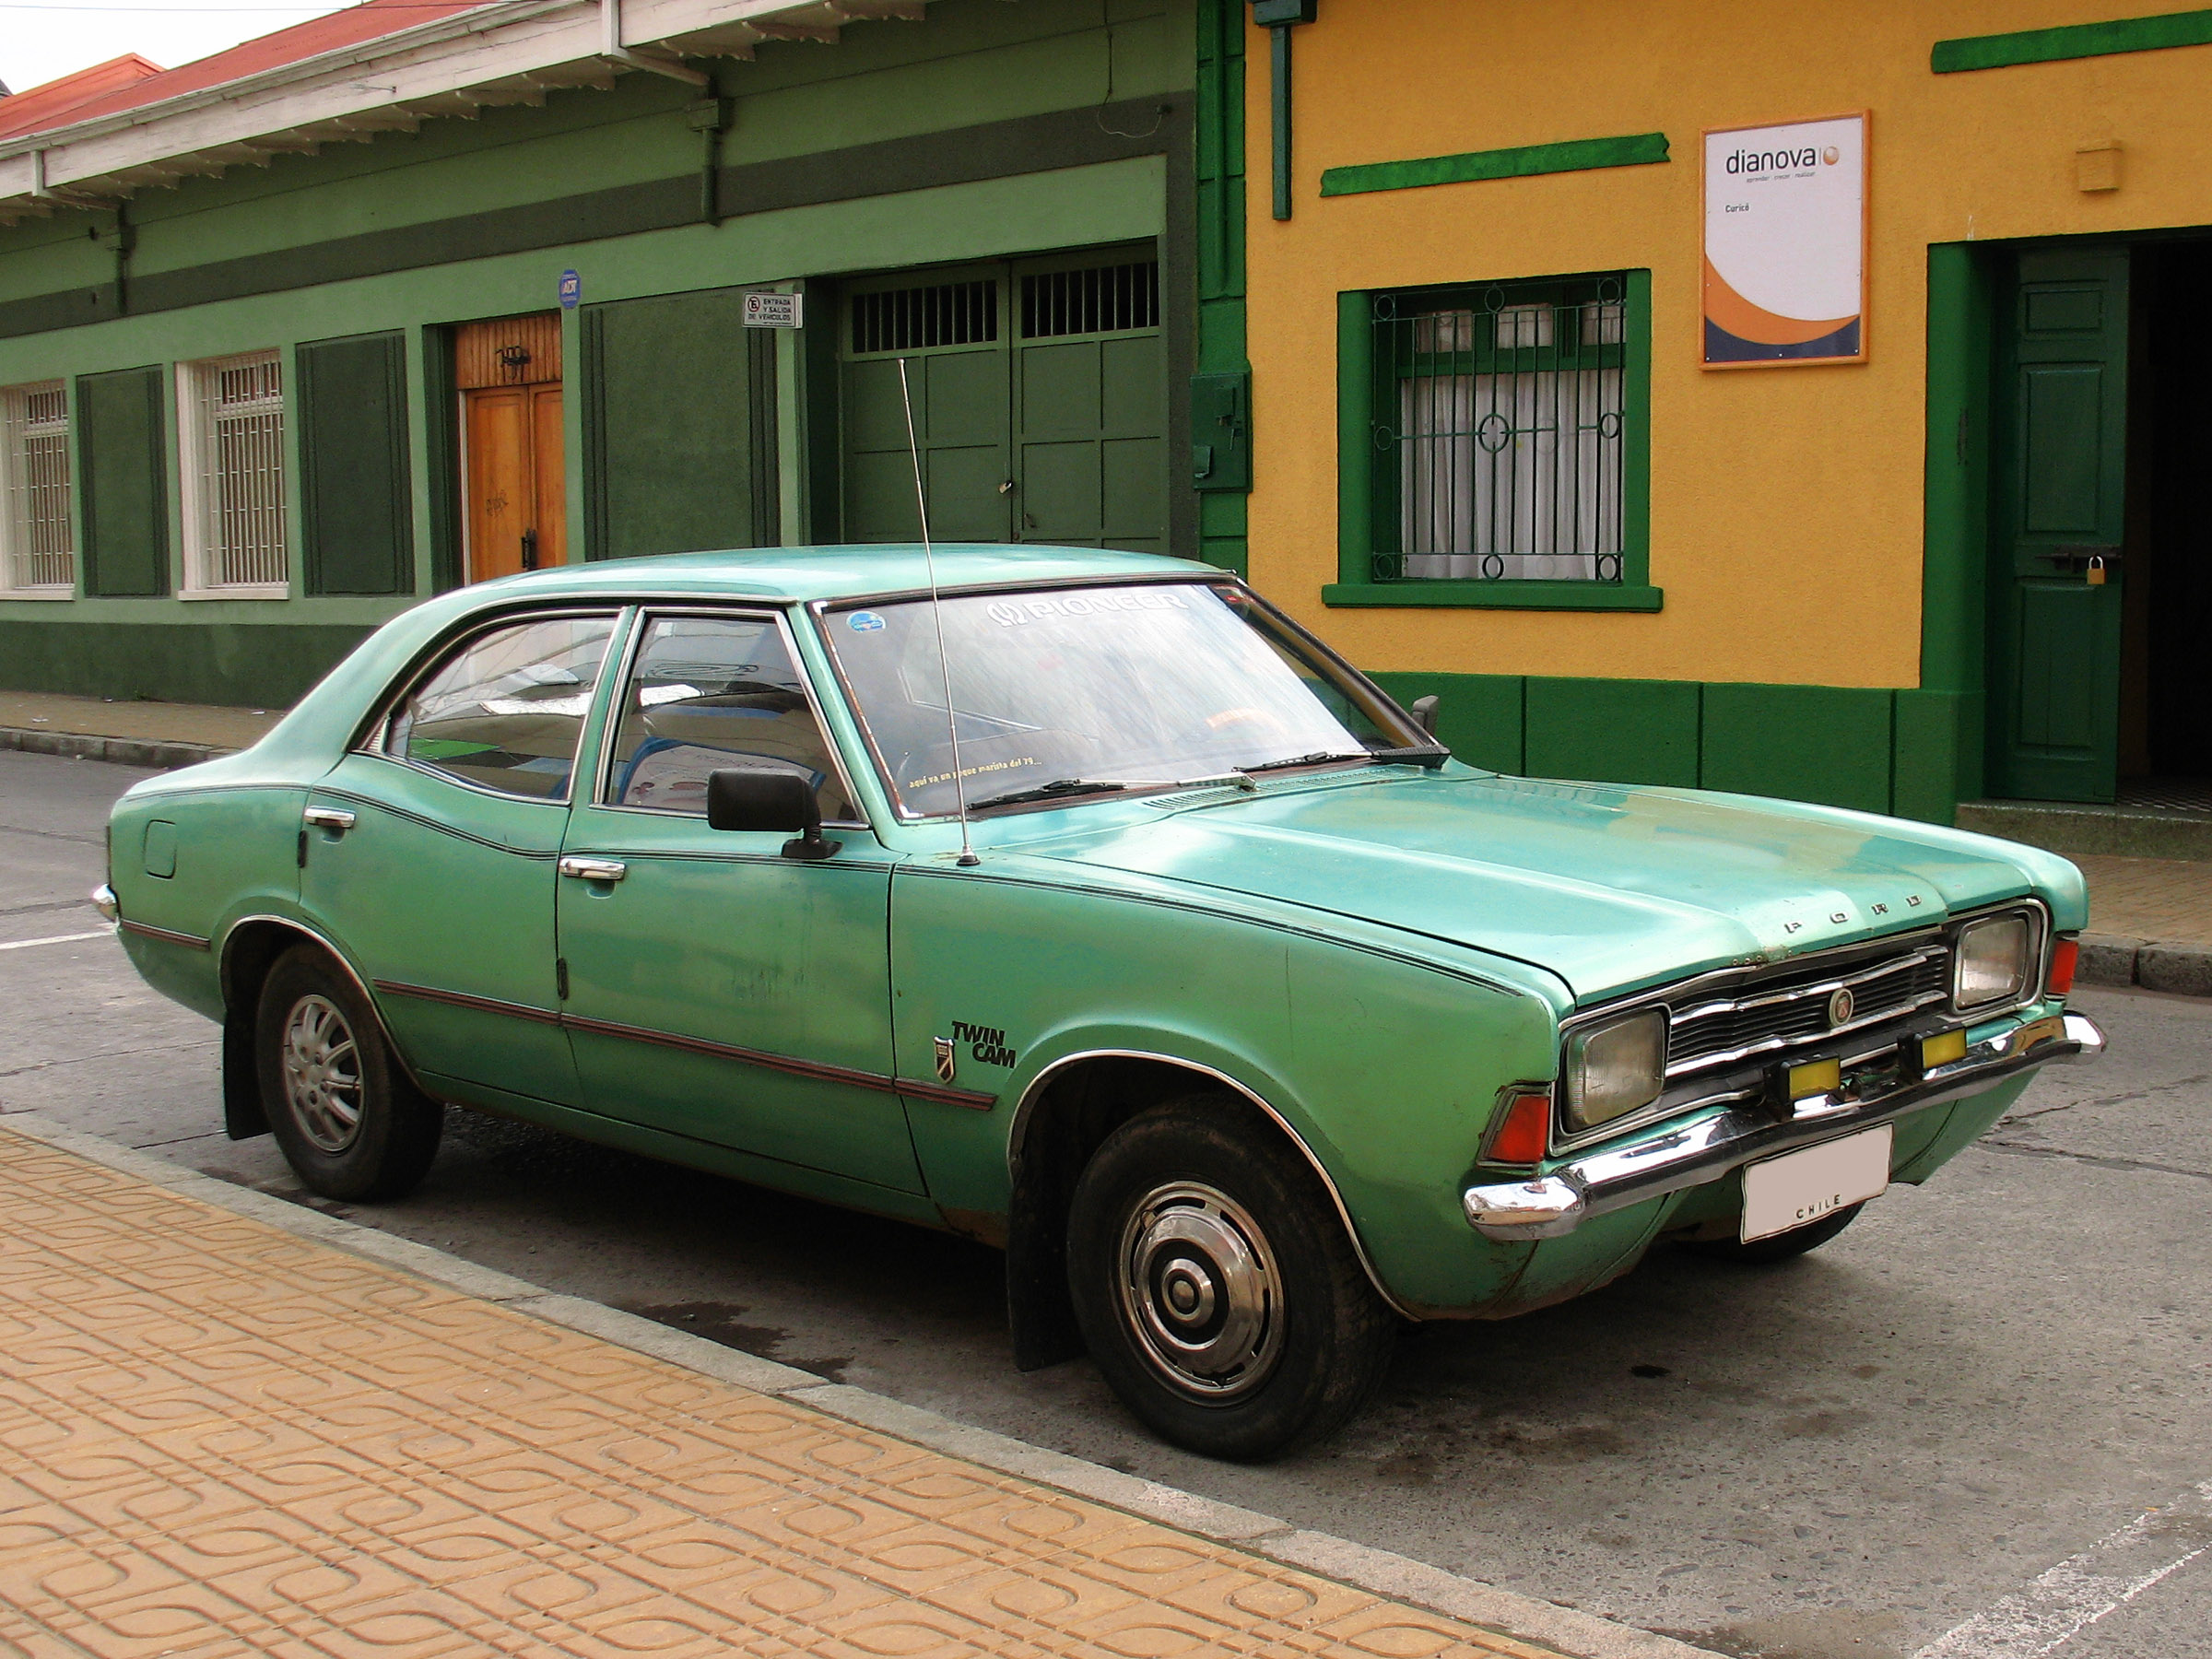 Ford_Cortina_1600_XLE_1976_(14603465848)